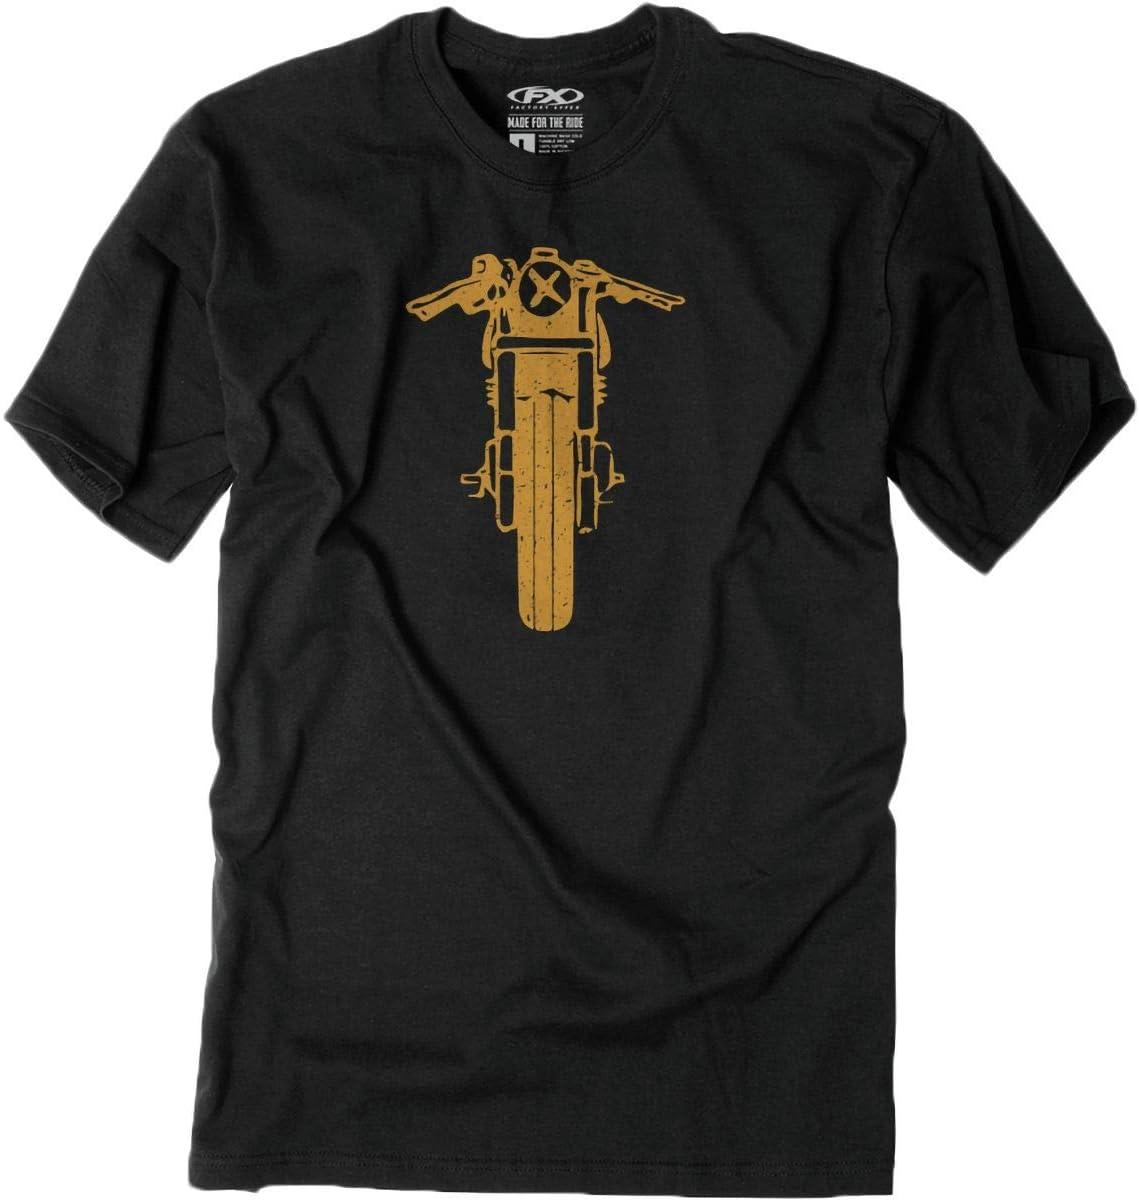 Black Factory Effex Bike T-Shirt Medium